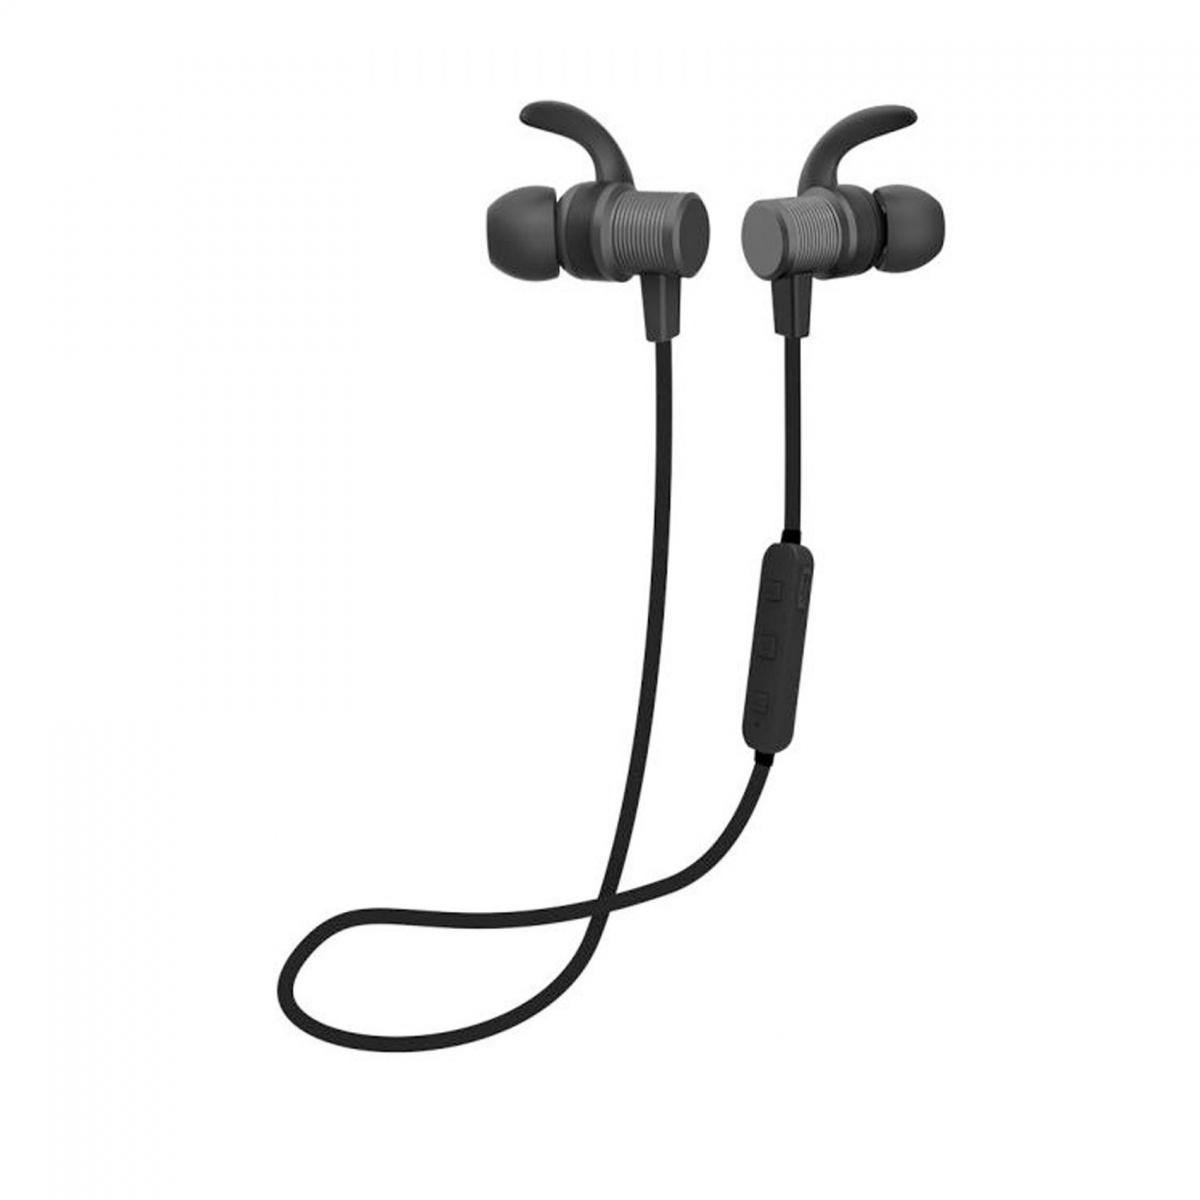 Vidvie 816 Sports Bluetooth Headset - Black